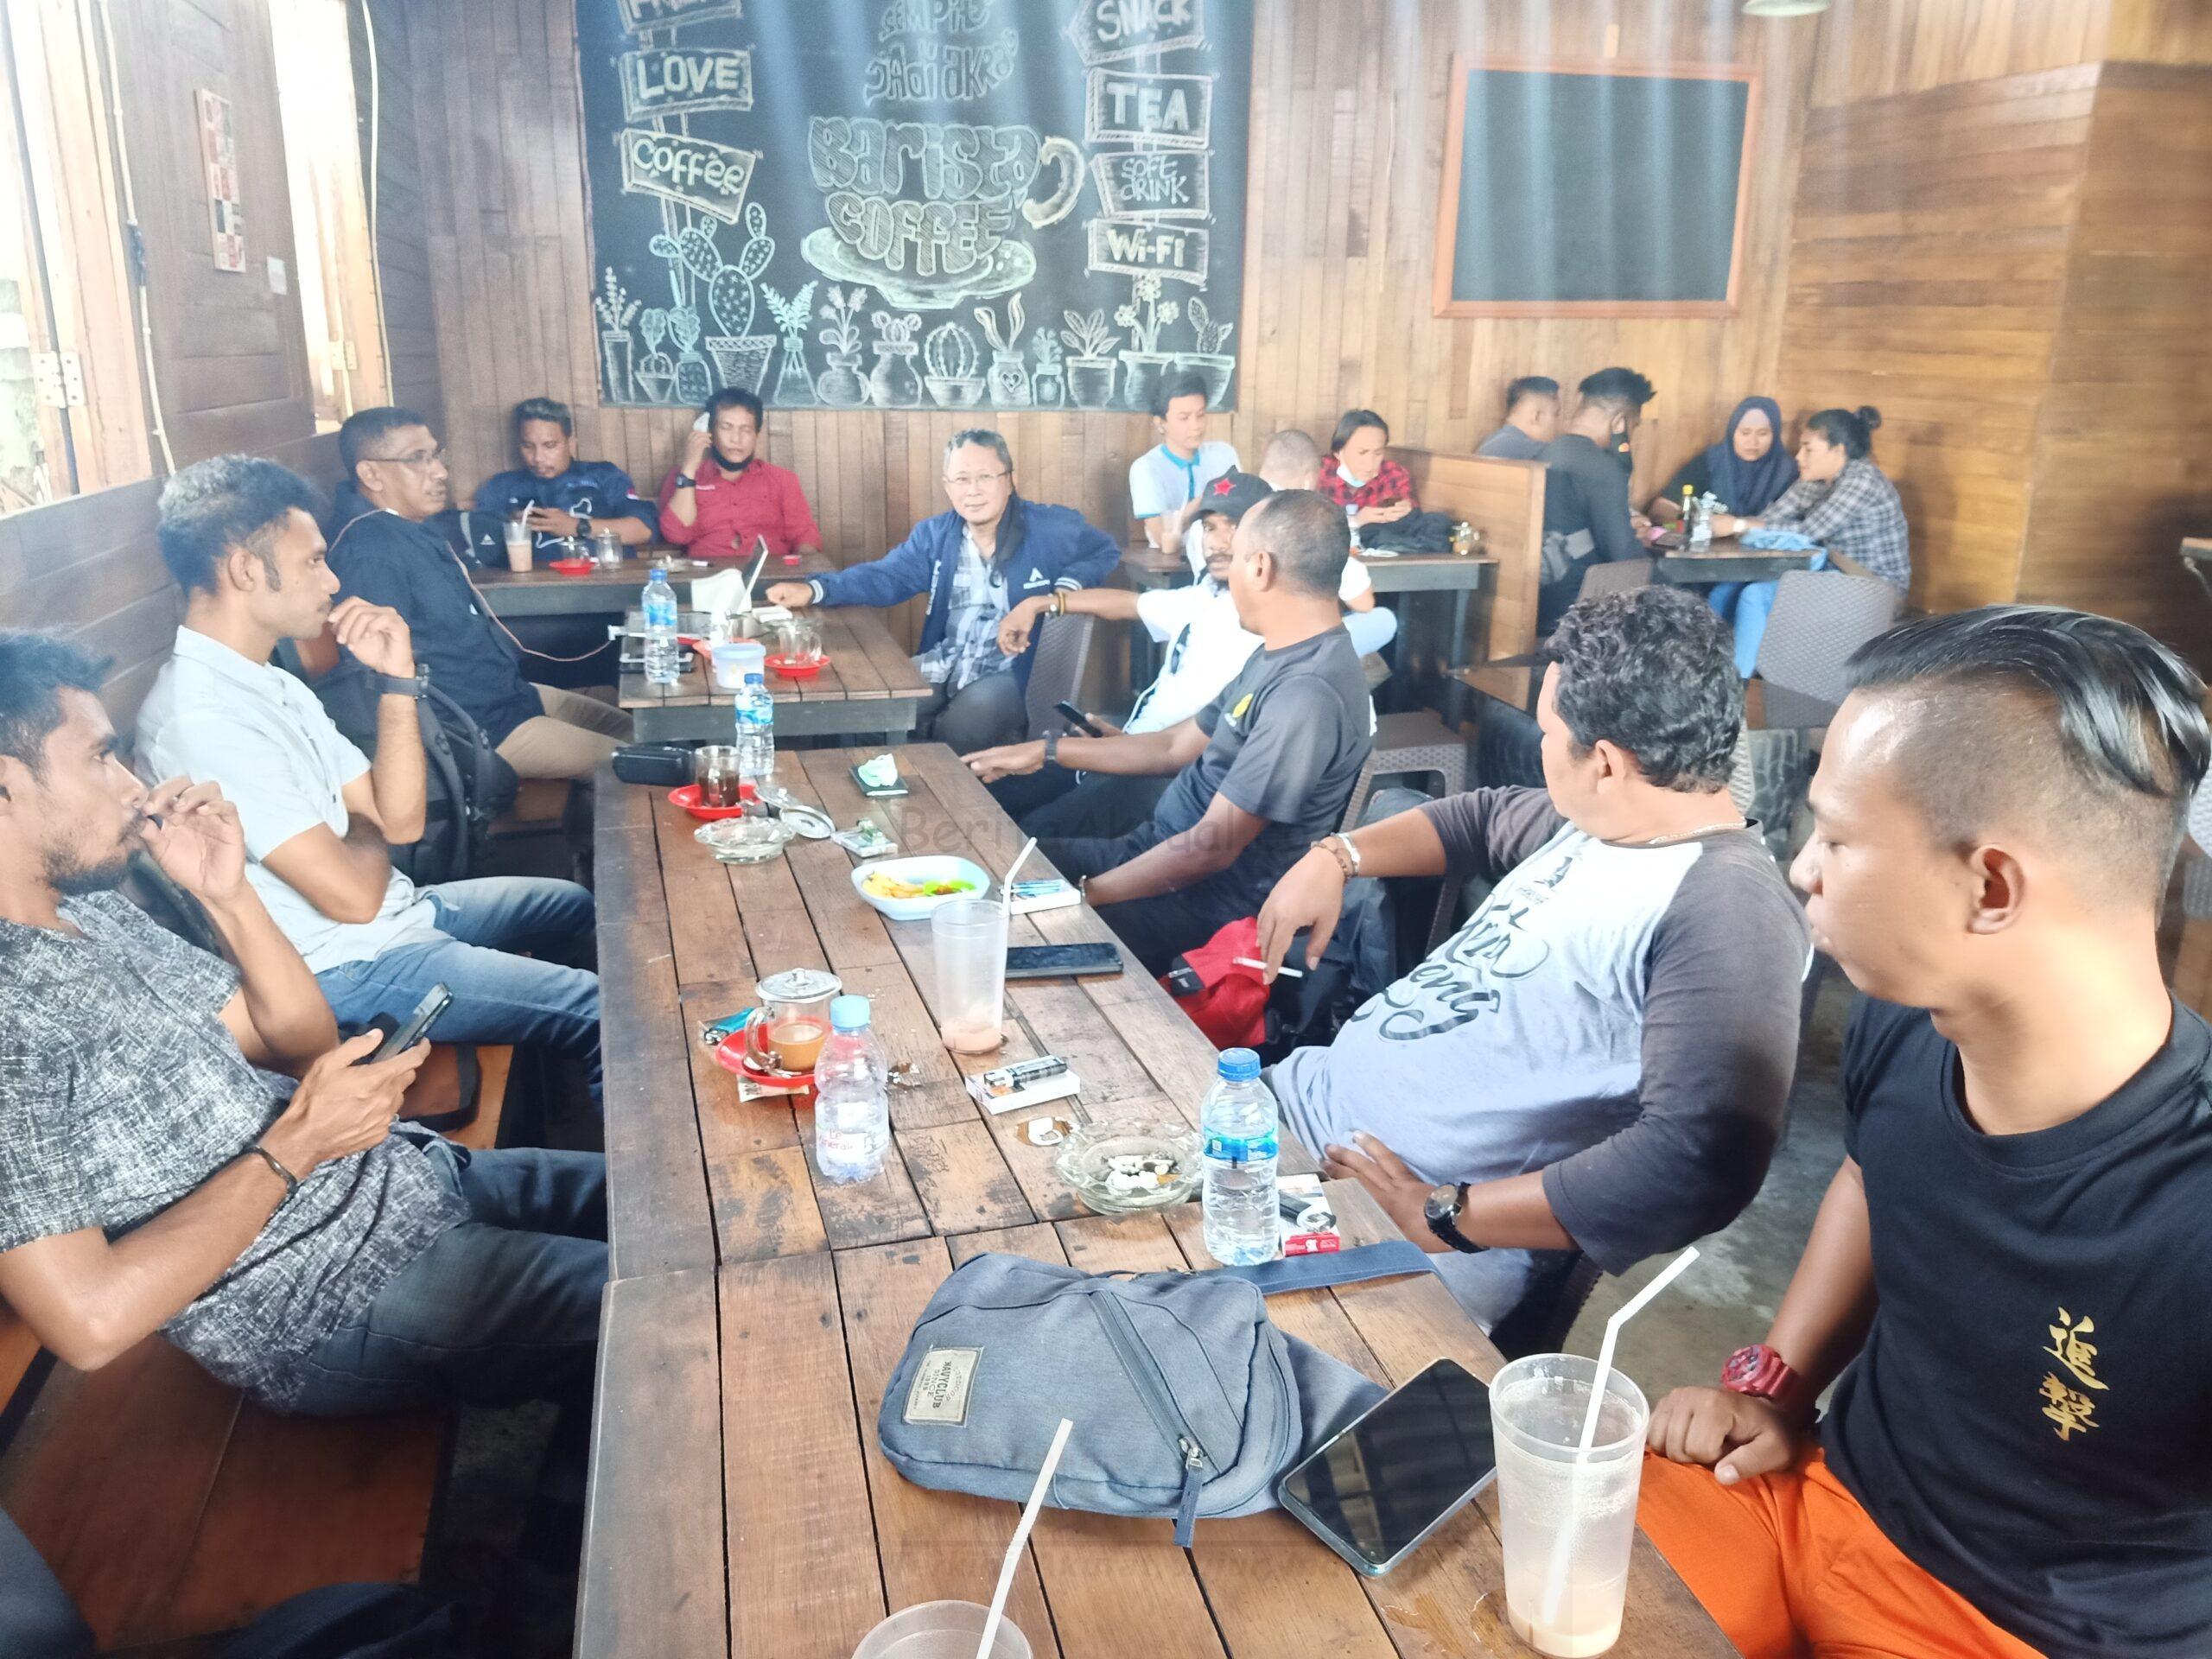 Basarnas Manokwari Coffee Break Bersama Insan Pers 10 IMG20210315162239 scaled